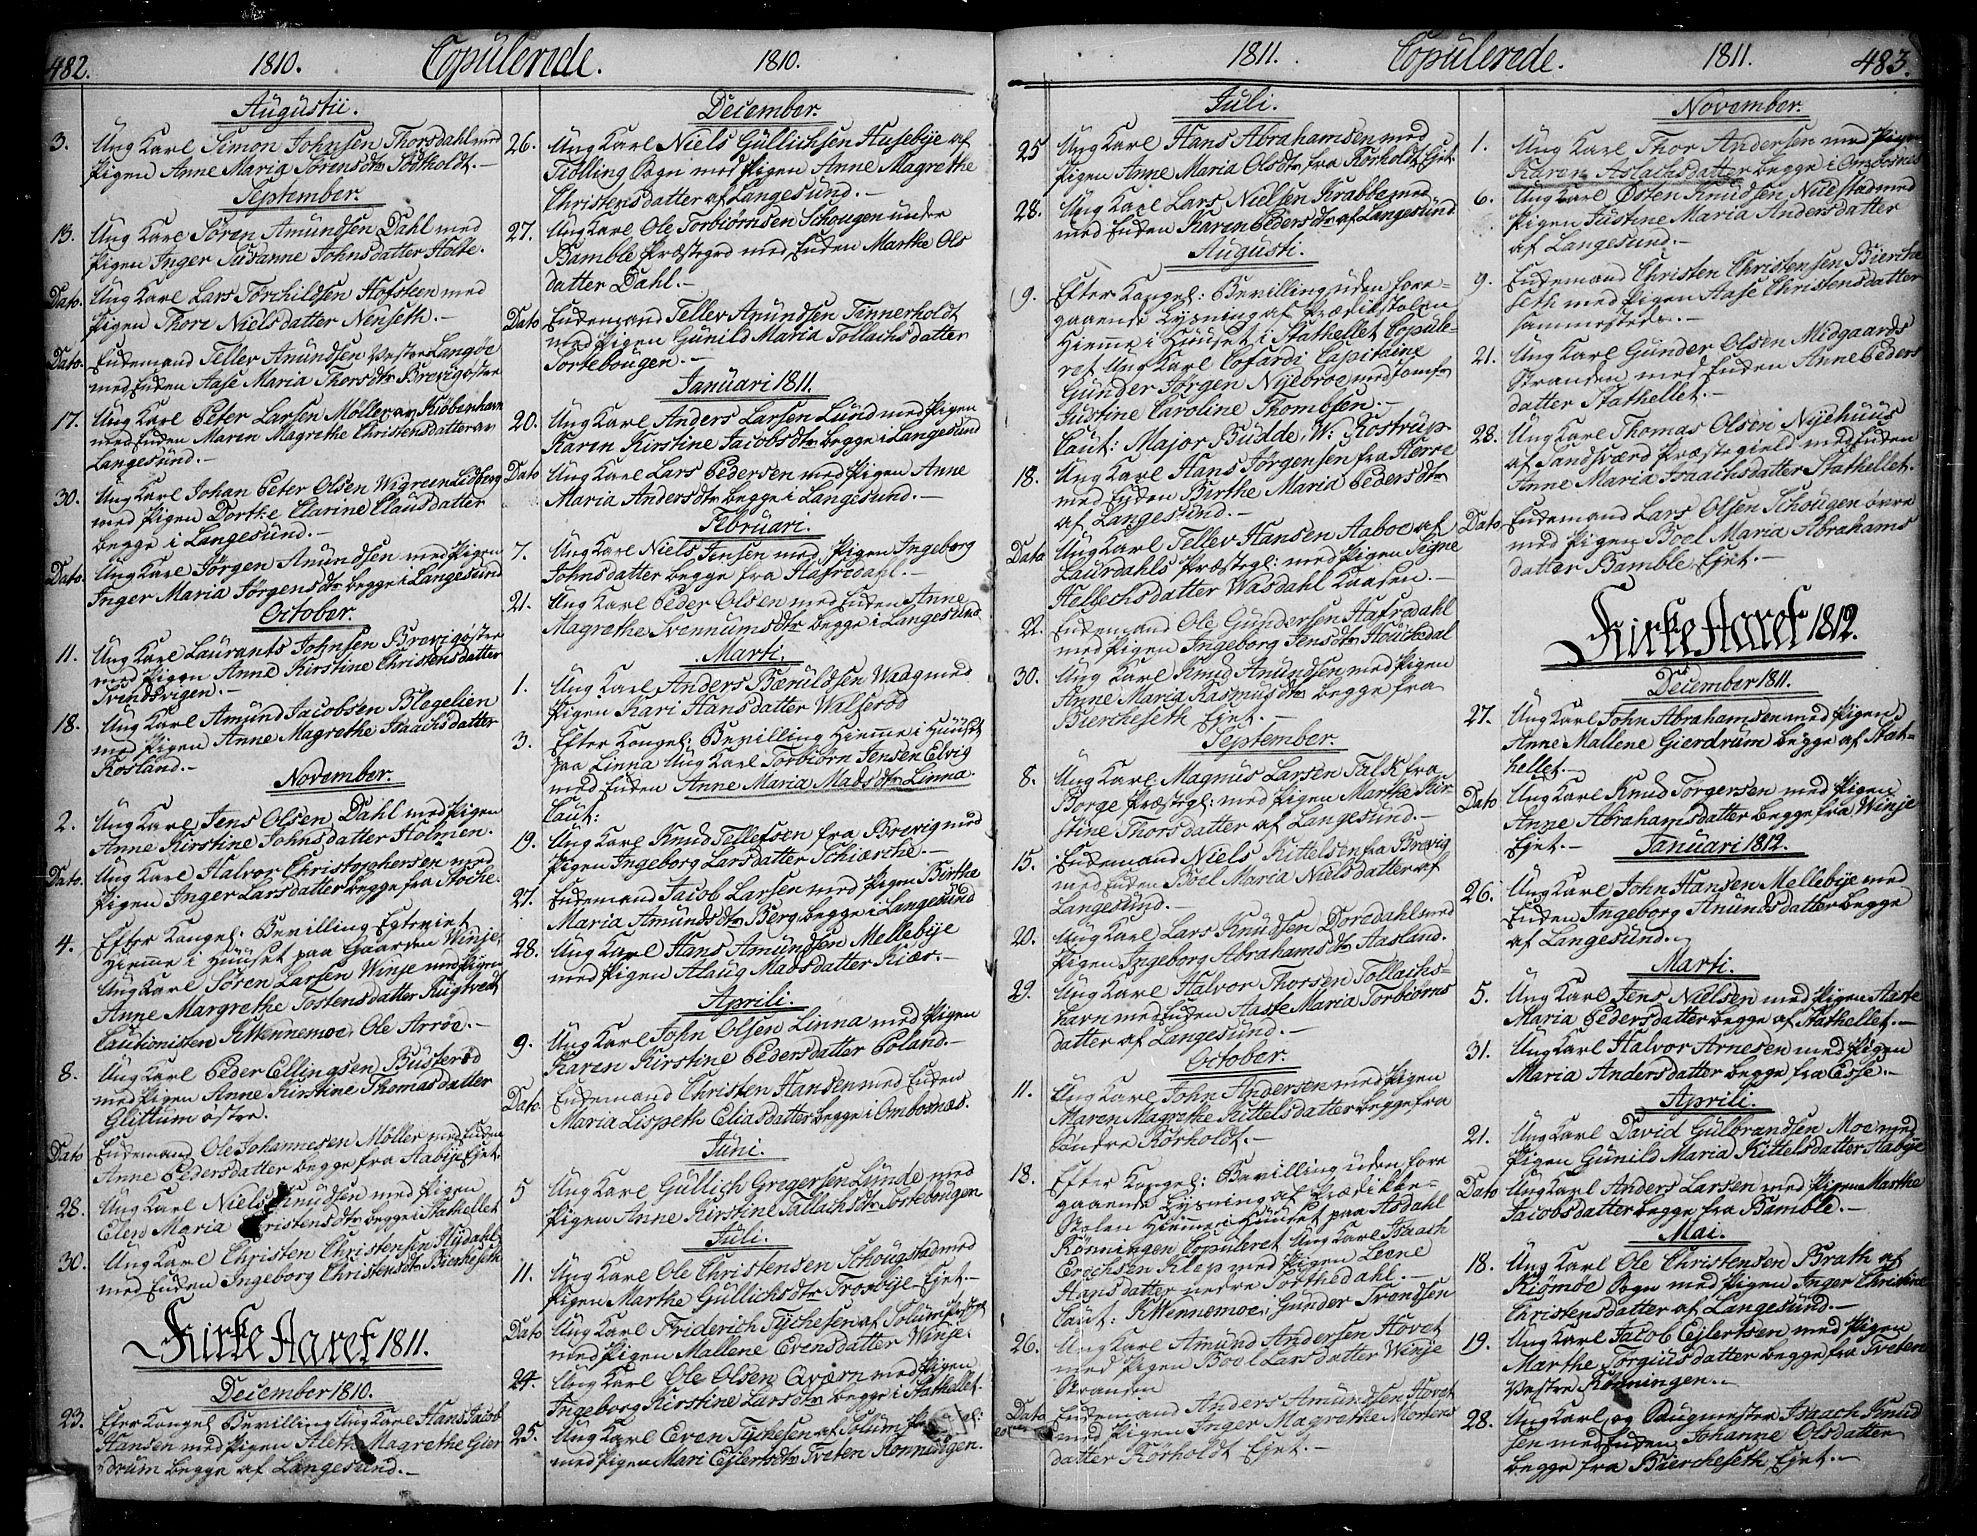 SAKO, Bamble kirkebøker, F/Fa/L0002: Ministerialbok nr. I 2, 1775-1814, s. 482-483